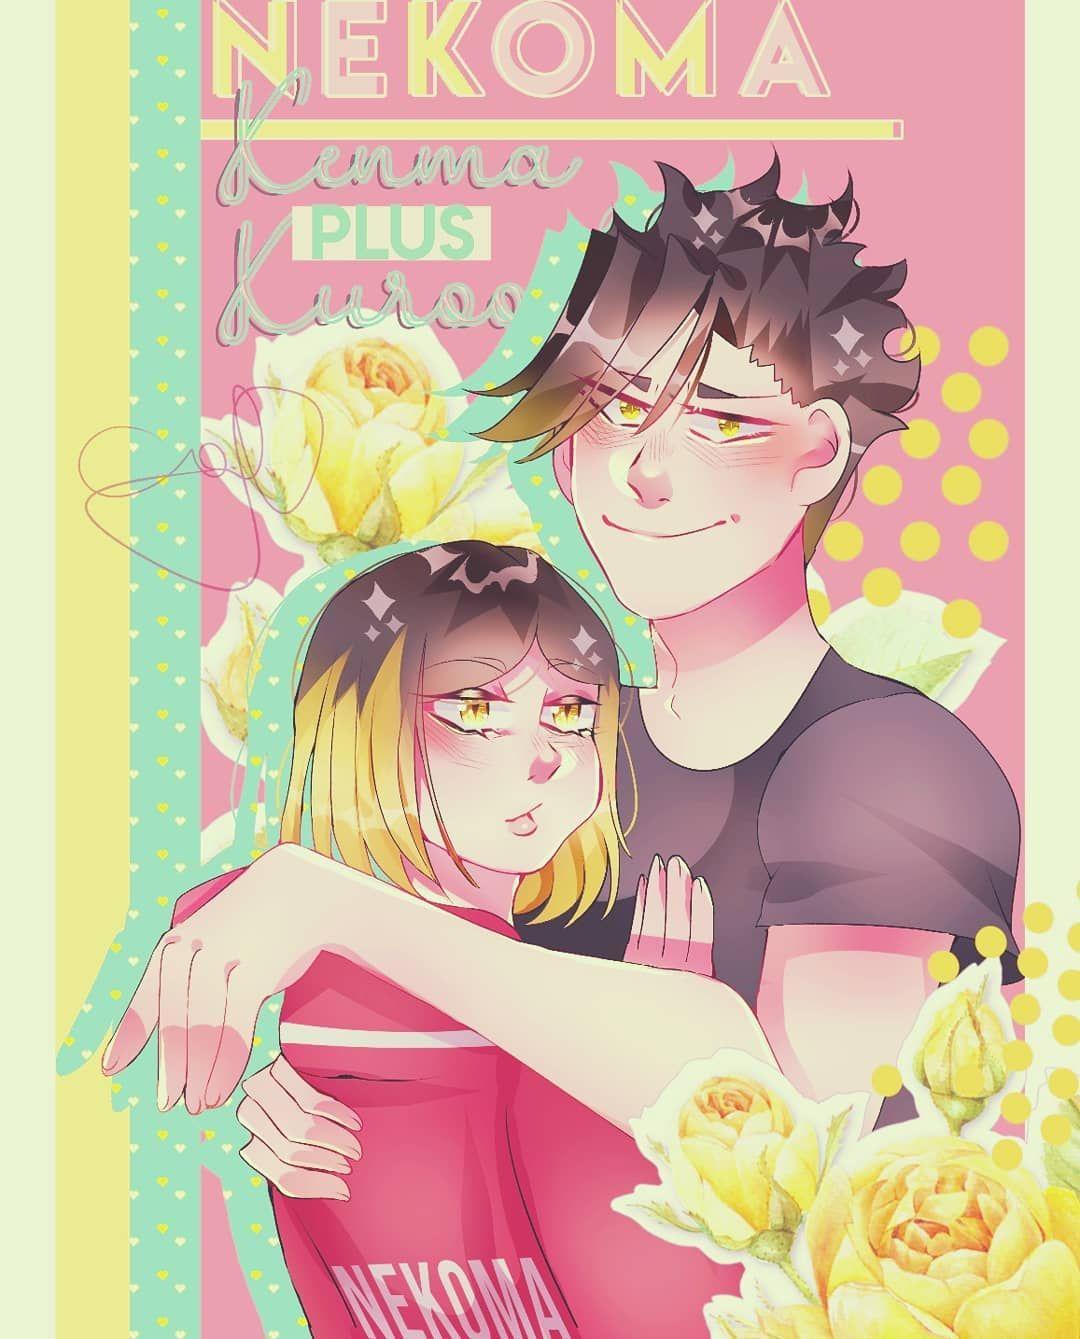 ❝Ehhh puedo explicar ok? Ahre que no, aguante Kuroken cjau. Soy una kakona dibujando onvres me perd0nan? 1?1₊˚✧ - - - - - - - - - - - - - Tags ↷ - - - - - - - - - #referencesheet #draw #drawings #drawing #Art #art #animegirls #animeartist #digitalart #digital #digitalartist #painttoolsai #fanart #haikyuu #haikyuuart #kuroken #kenma #kenmaxkuroo #kurooxkenma #mangadrawing